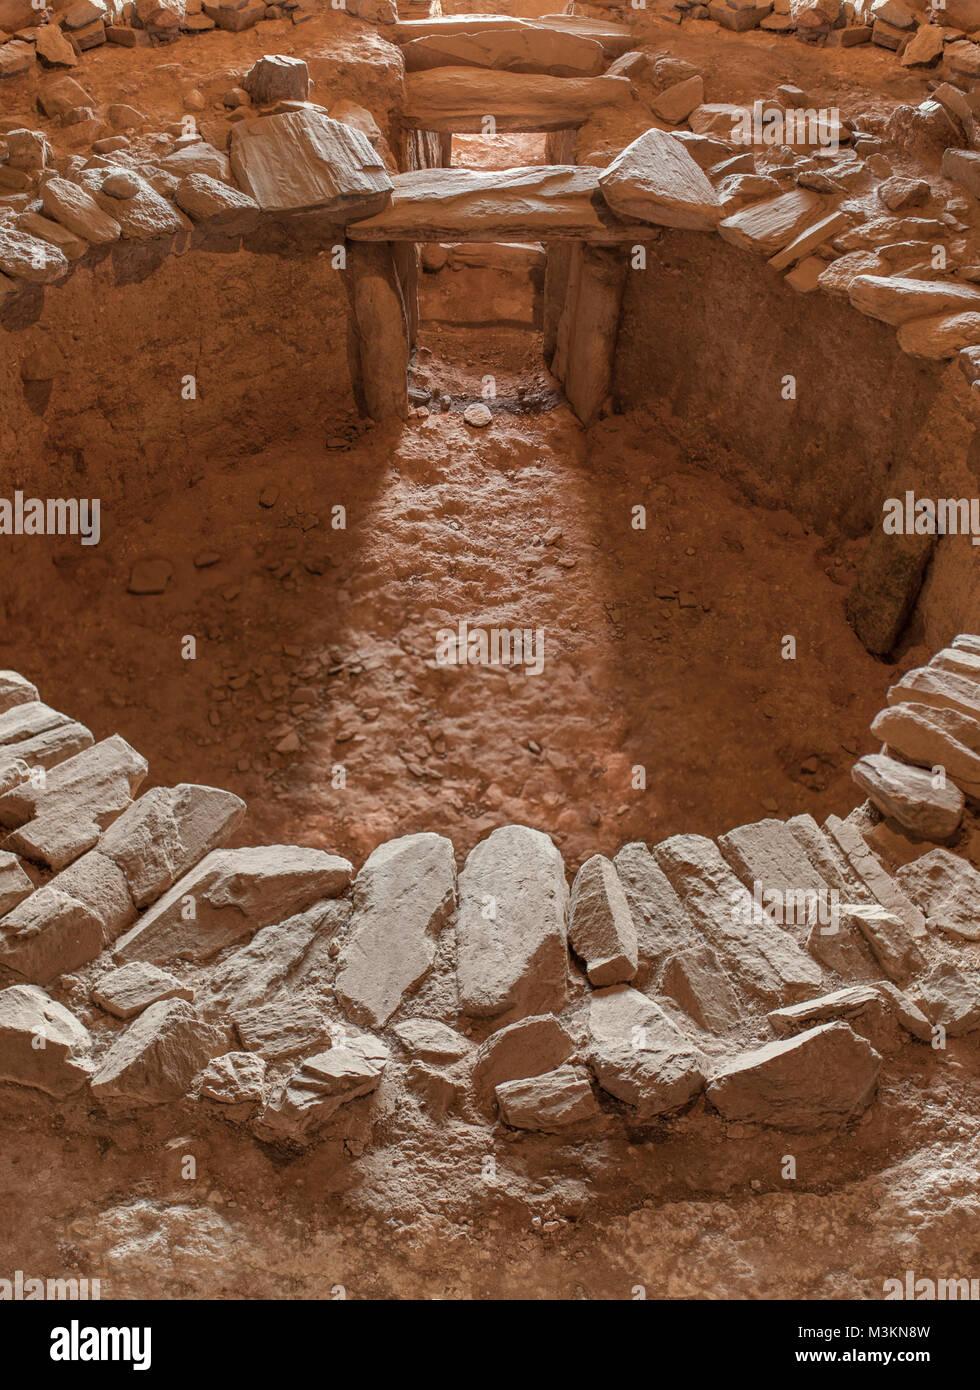 Archeological site of Huerta Montero, Calcholitic Tholos Dolmen. First winter solstice sunray. Almendralejo, Spain - Stock Image